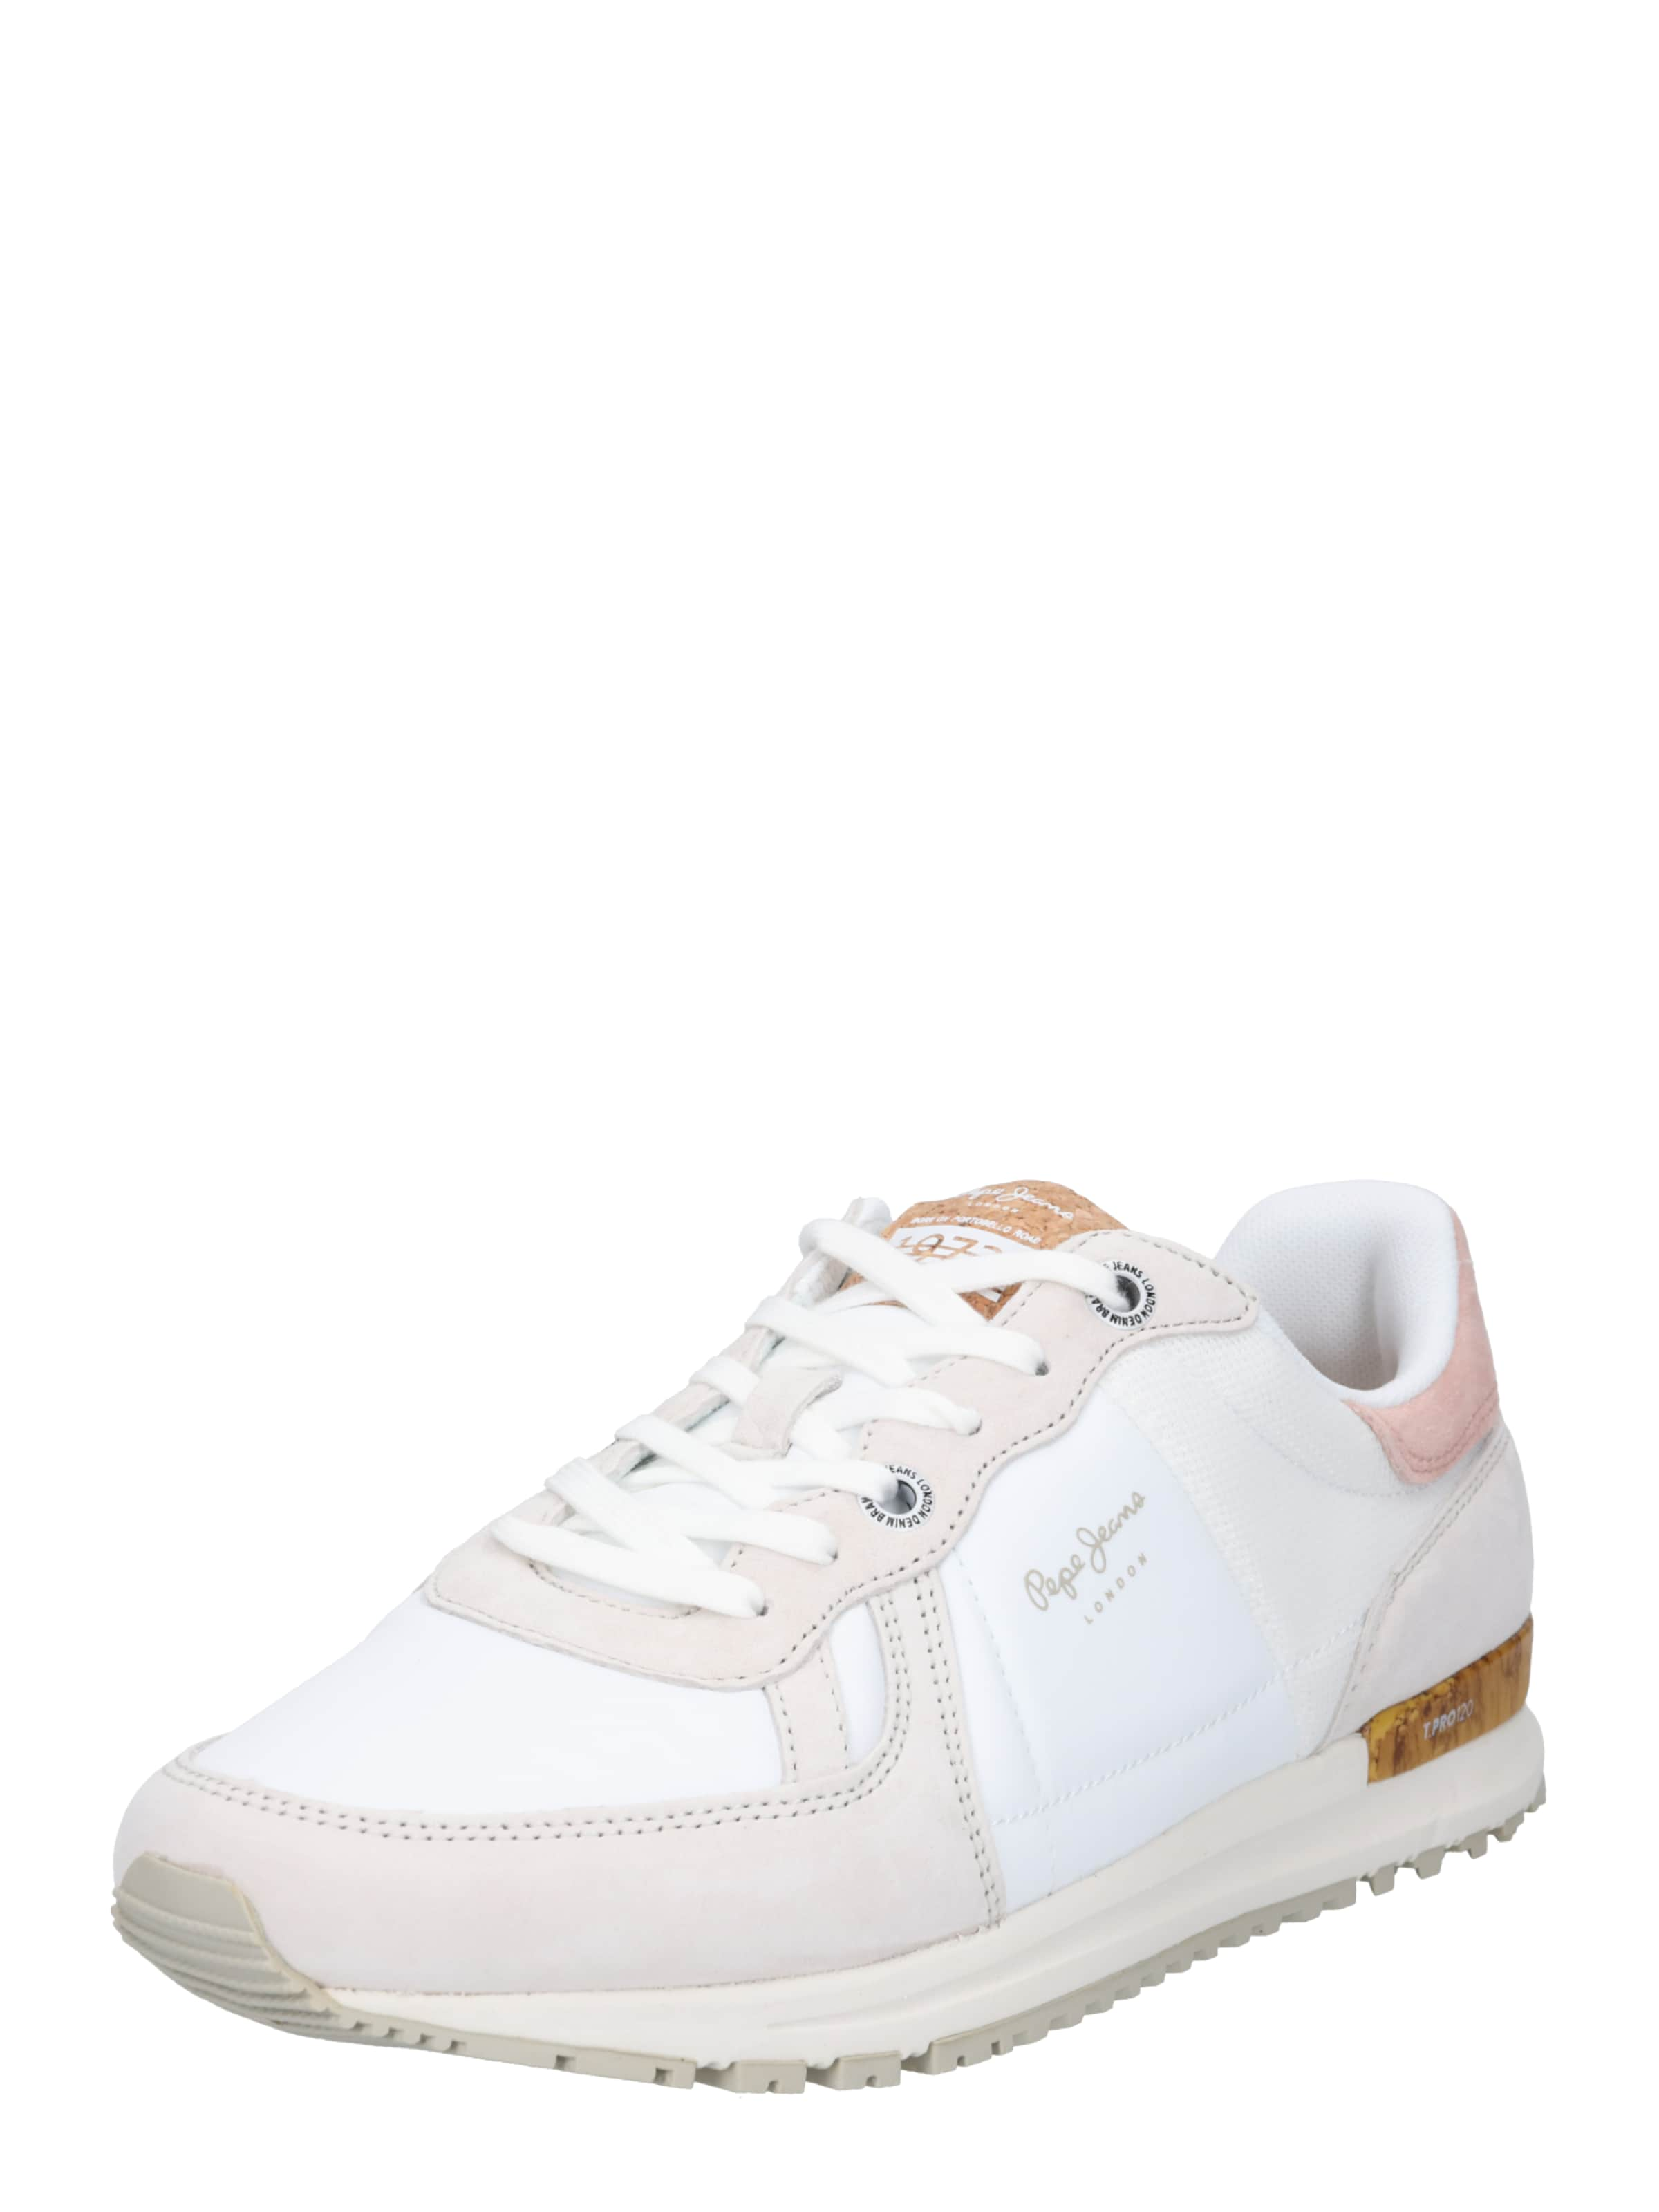 Pro Jeans Weiß Premium' 'tinker In Pepe Sneaker xQrtshdC